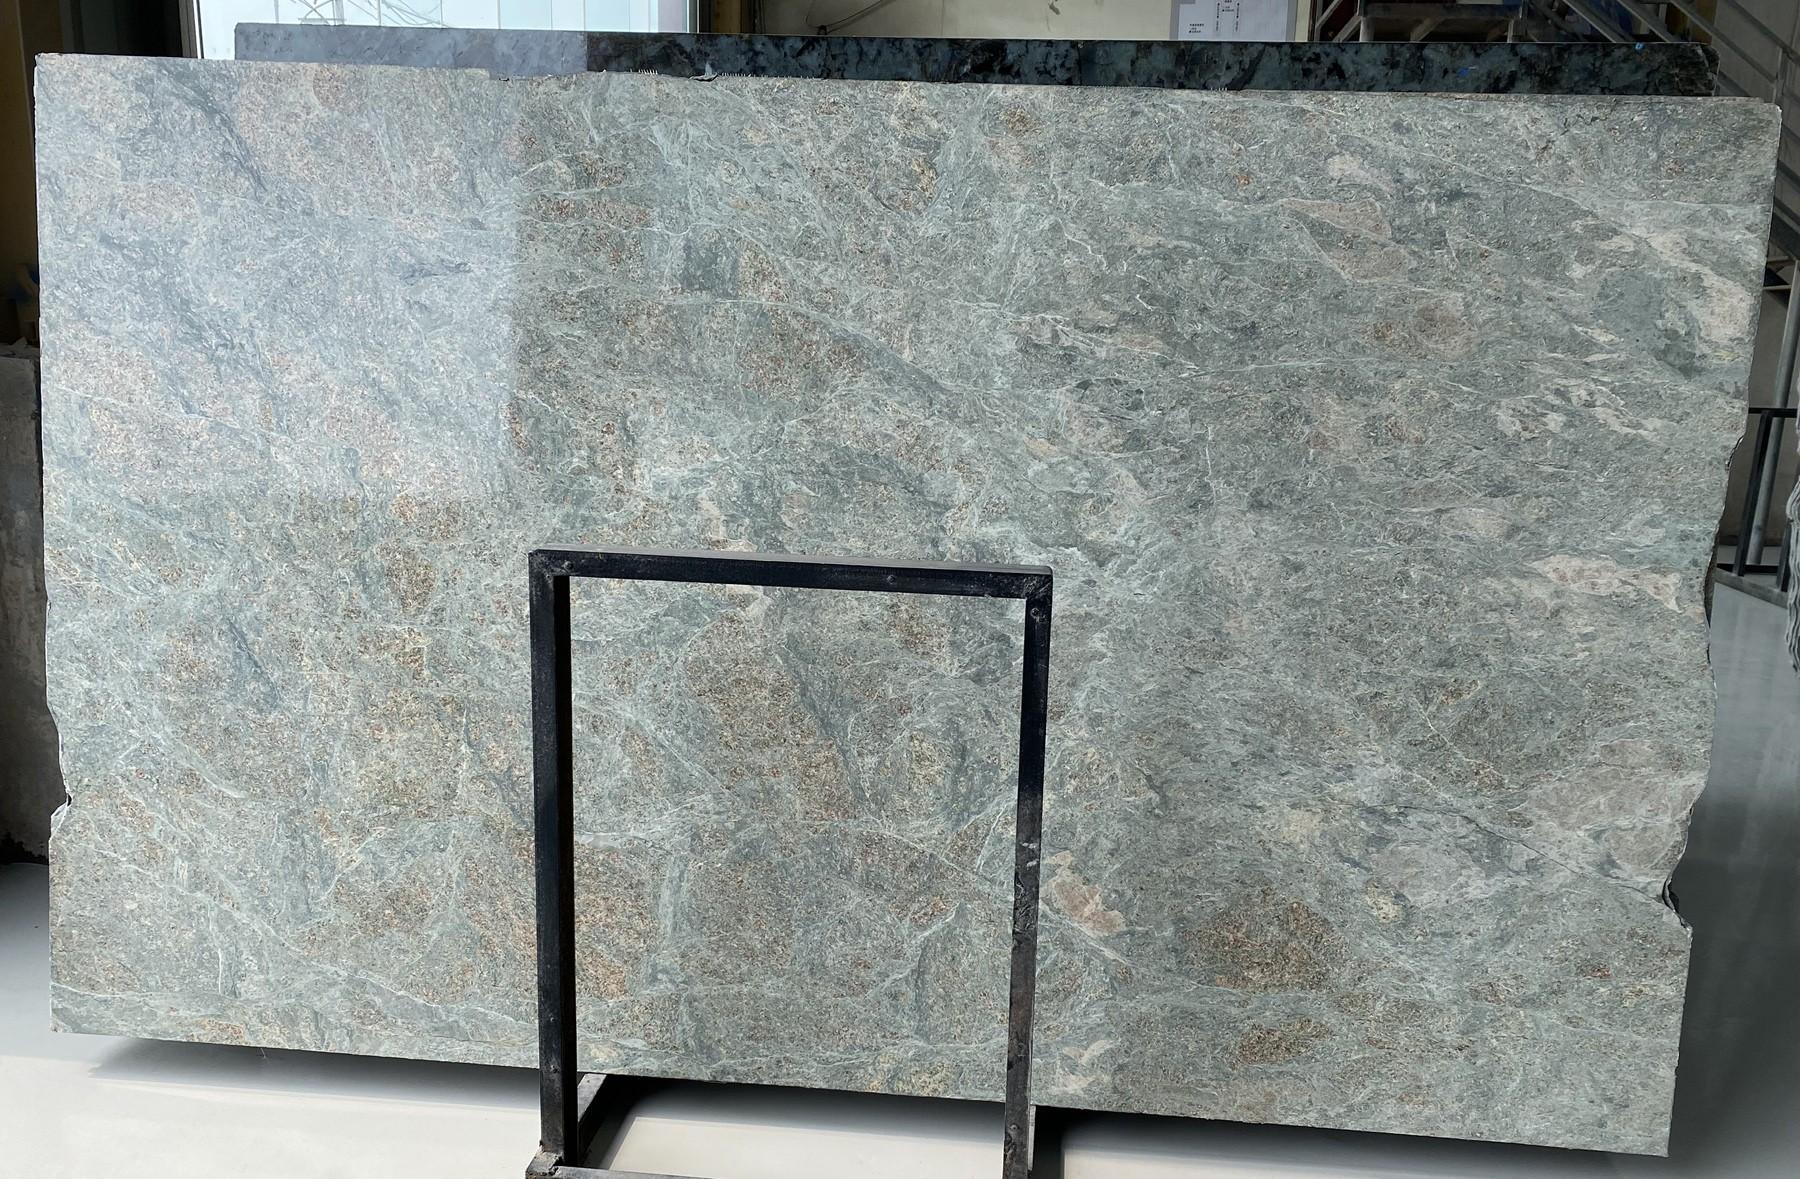 LT GREEN polierte Unmaßplatten D2109 aus Natur Granit , Bundle #01: Lieferung Fujian, China